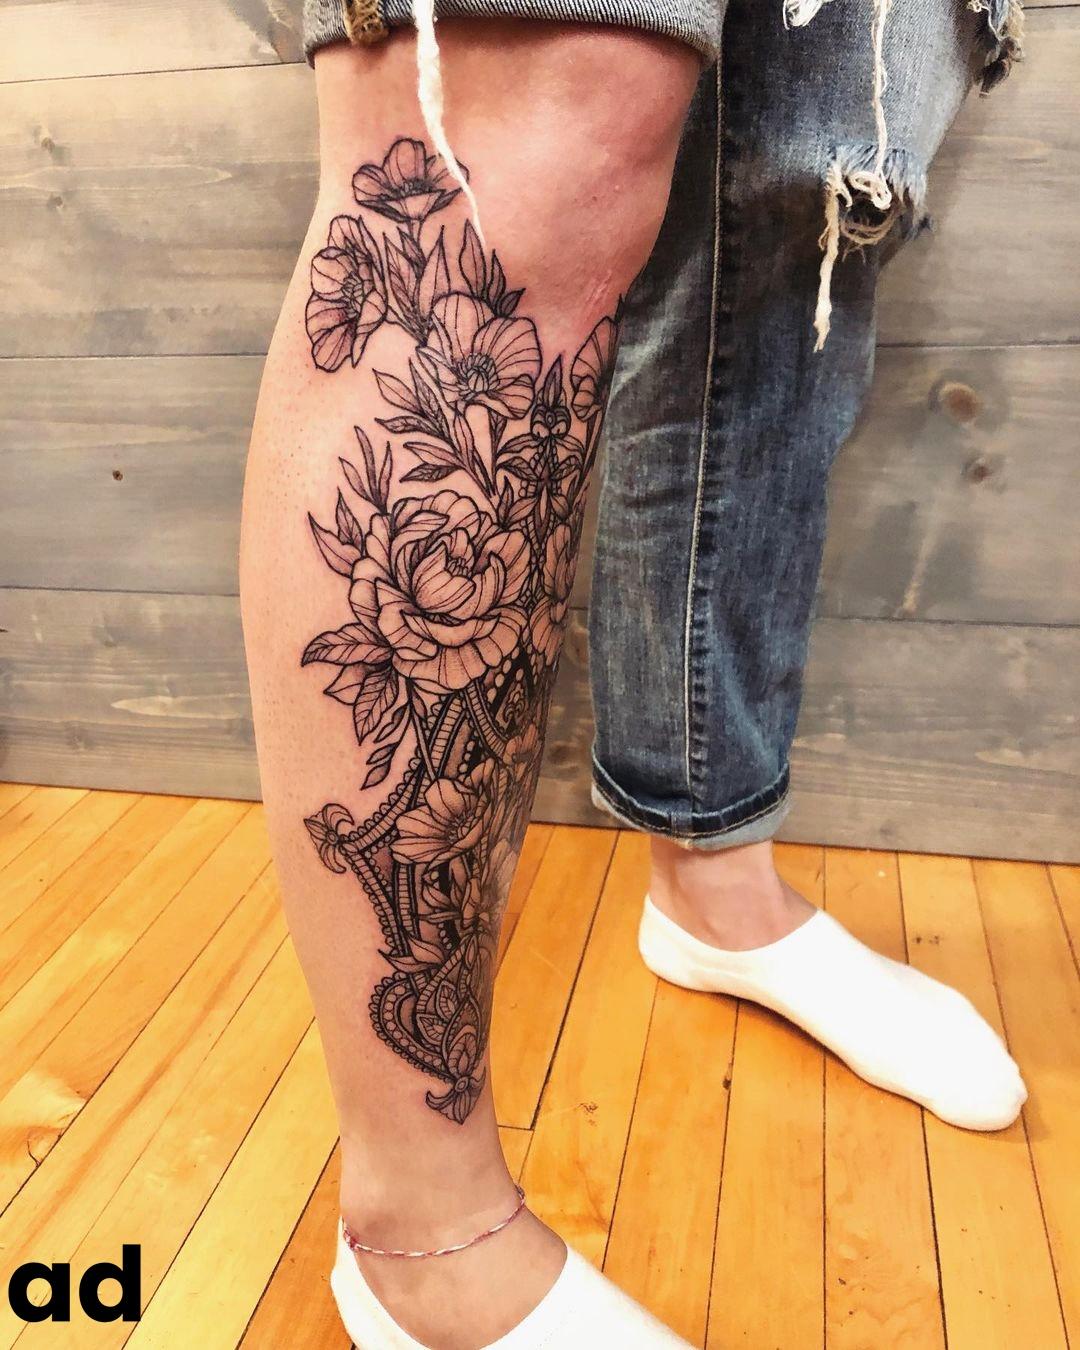 Epic Leg Tattoo Ideas for a Stylish Look